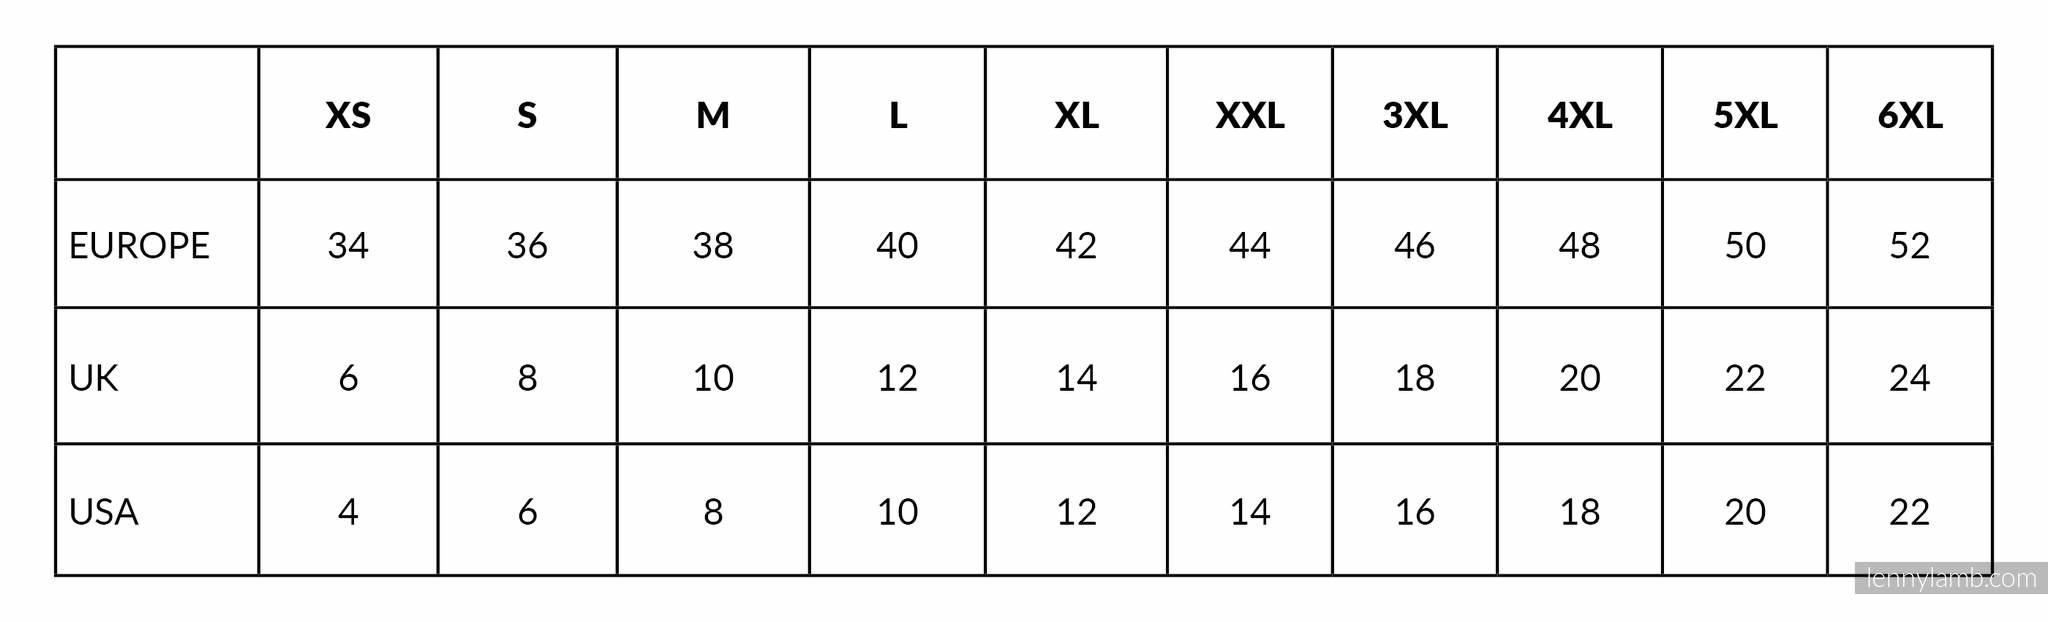 Lenny Lamb Sweatshirt sizing chart